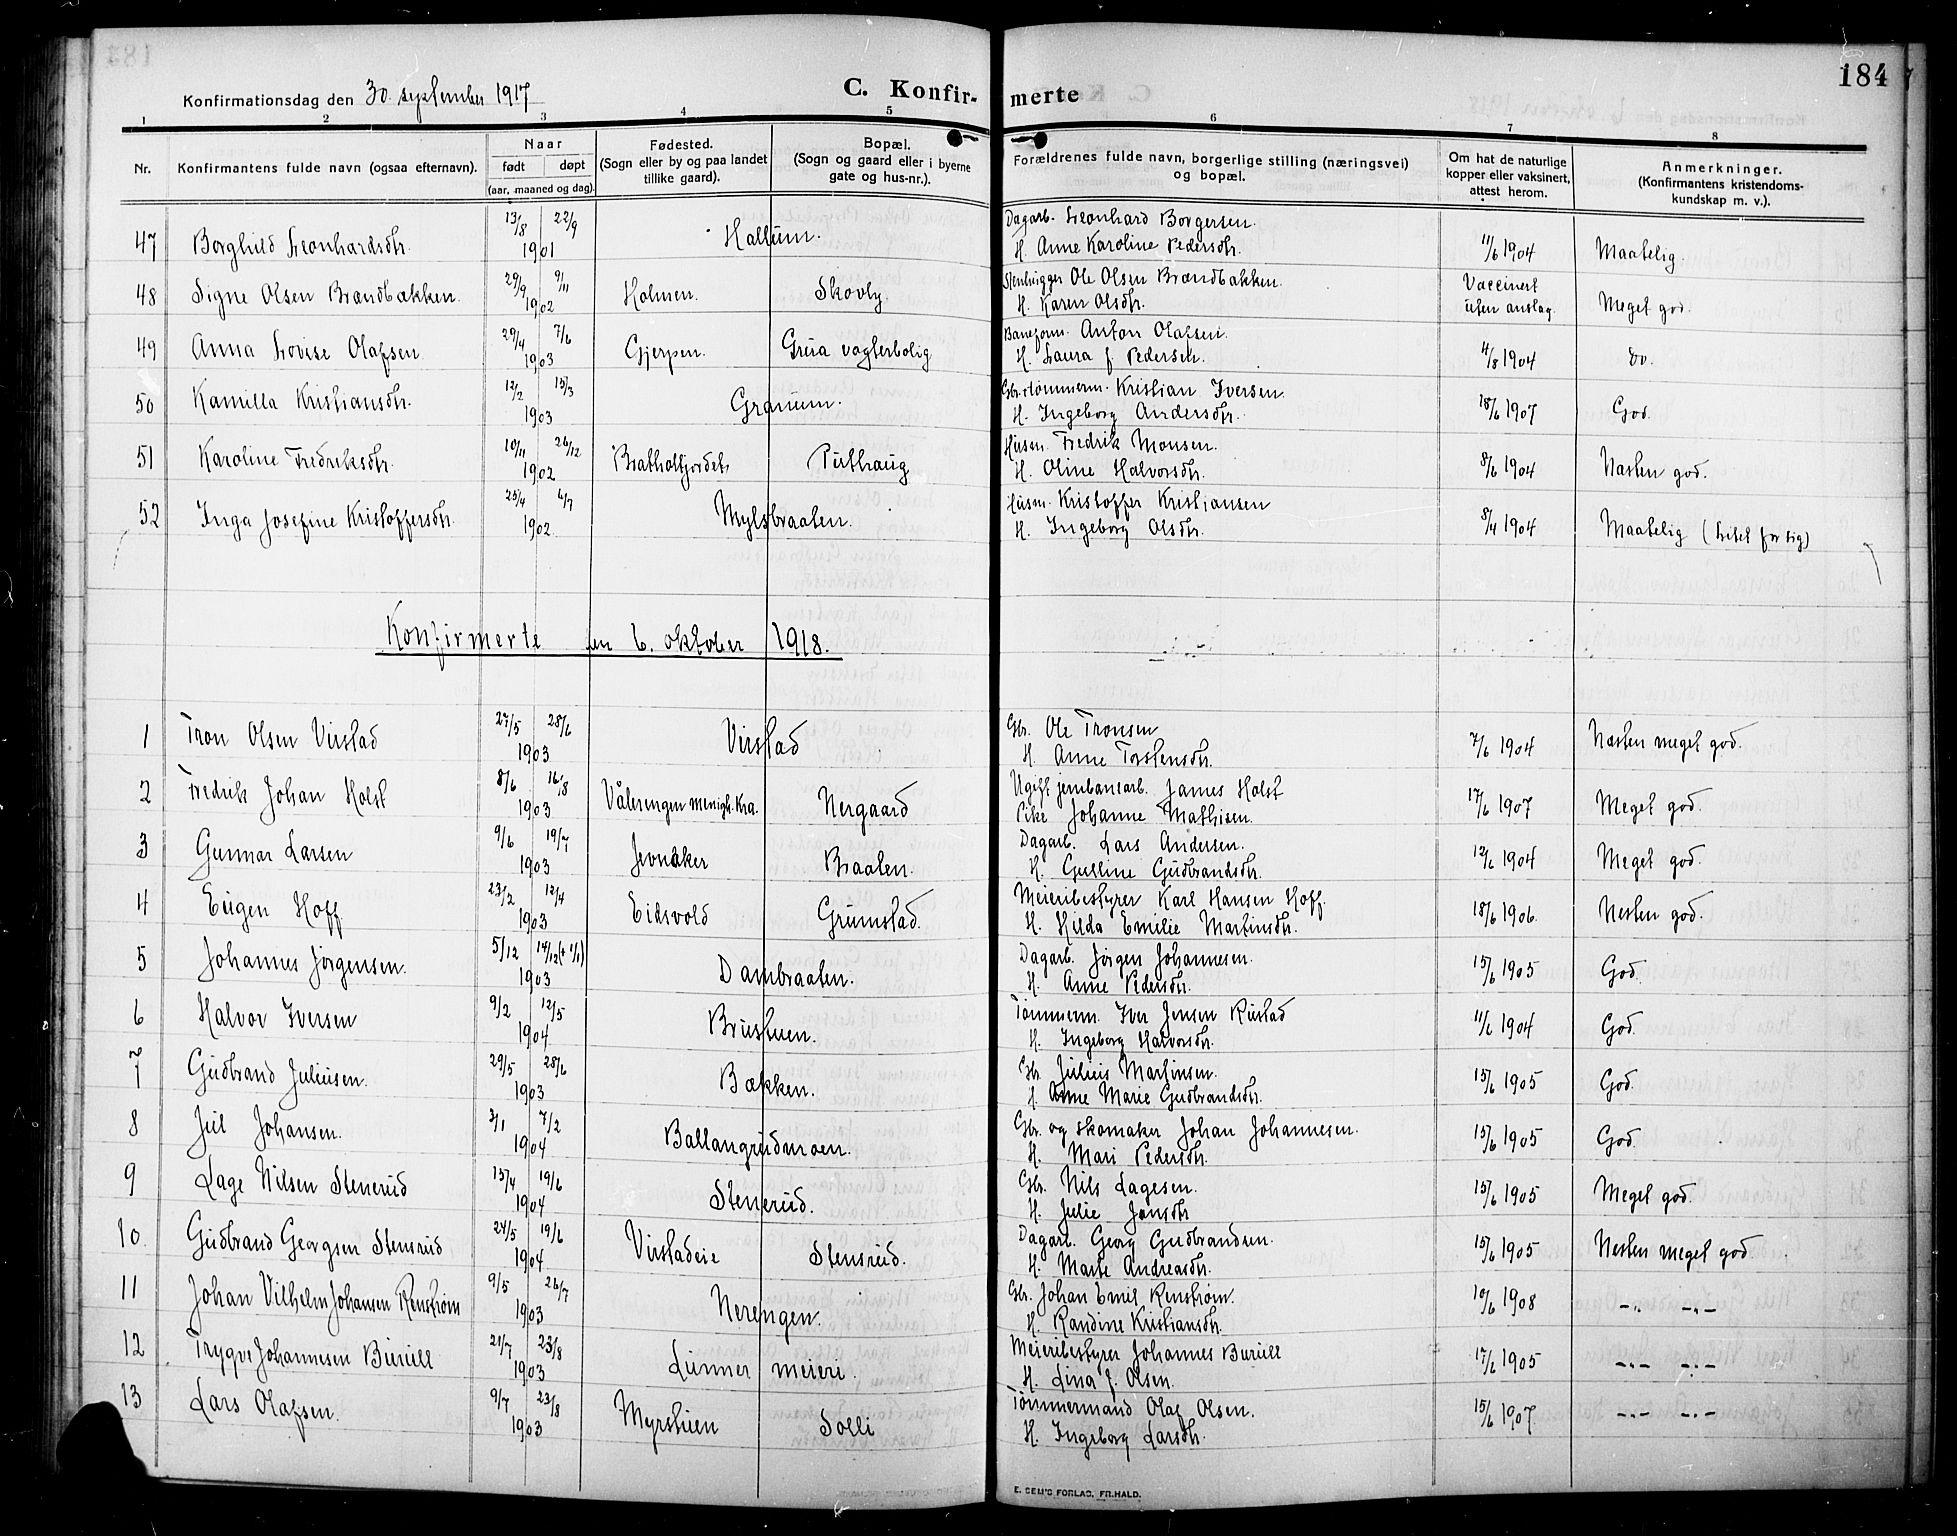 SAH, Lunner prestekontor, H/Ha/Hab/L0001: Klokkerbok nr. 1, 1909-1922, s. 184